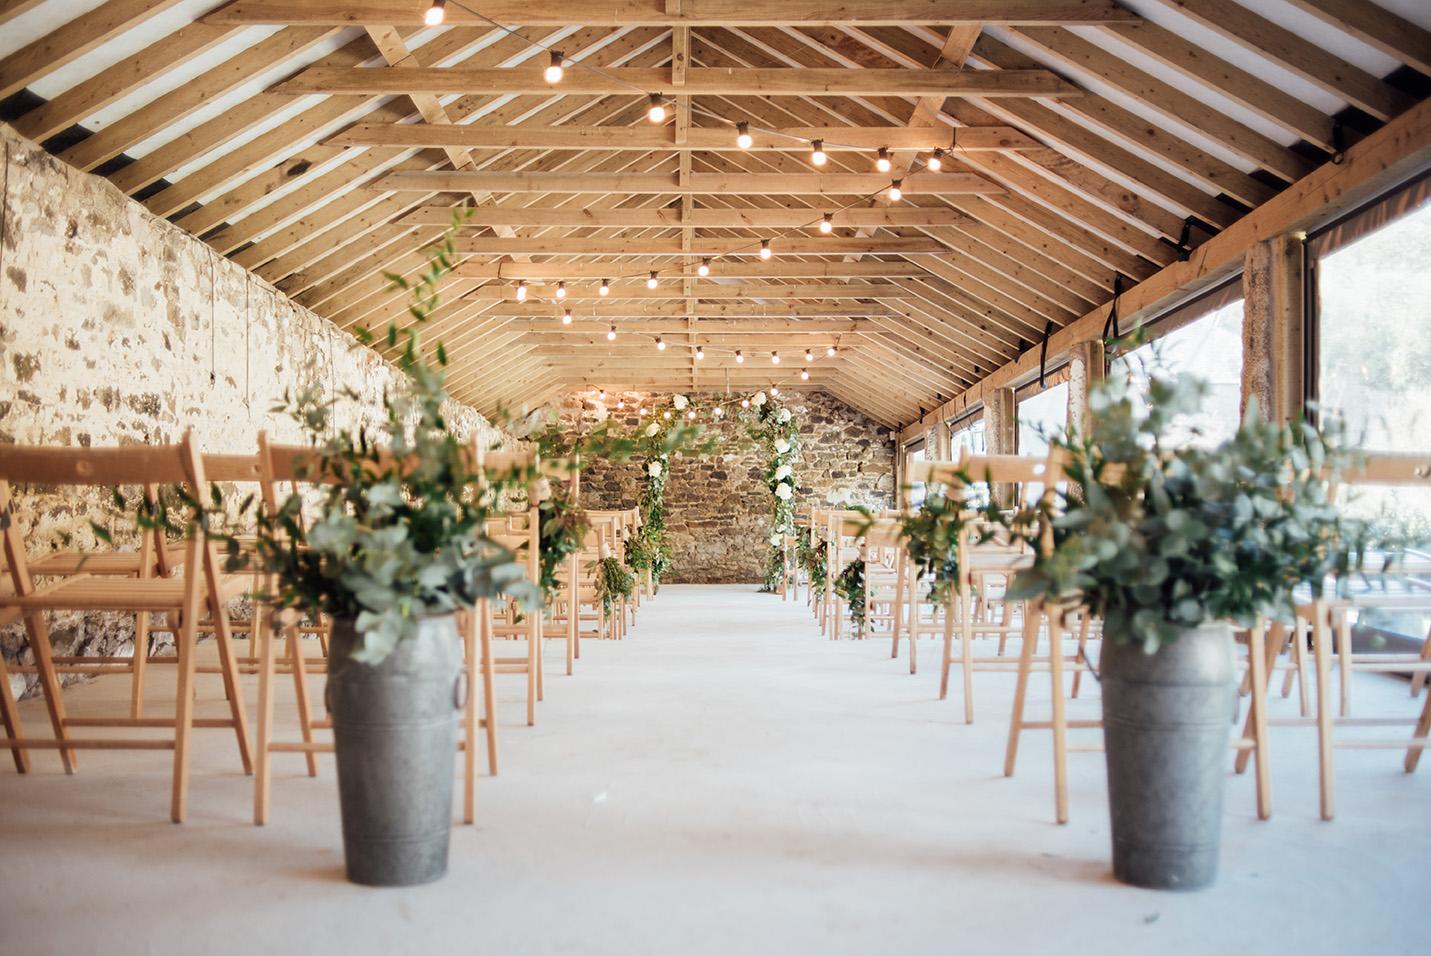 Weddings Pengenna Manor Bespoke Weddings And Events In Cornwall